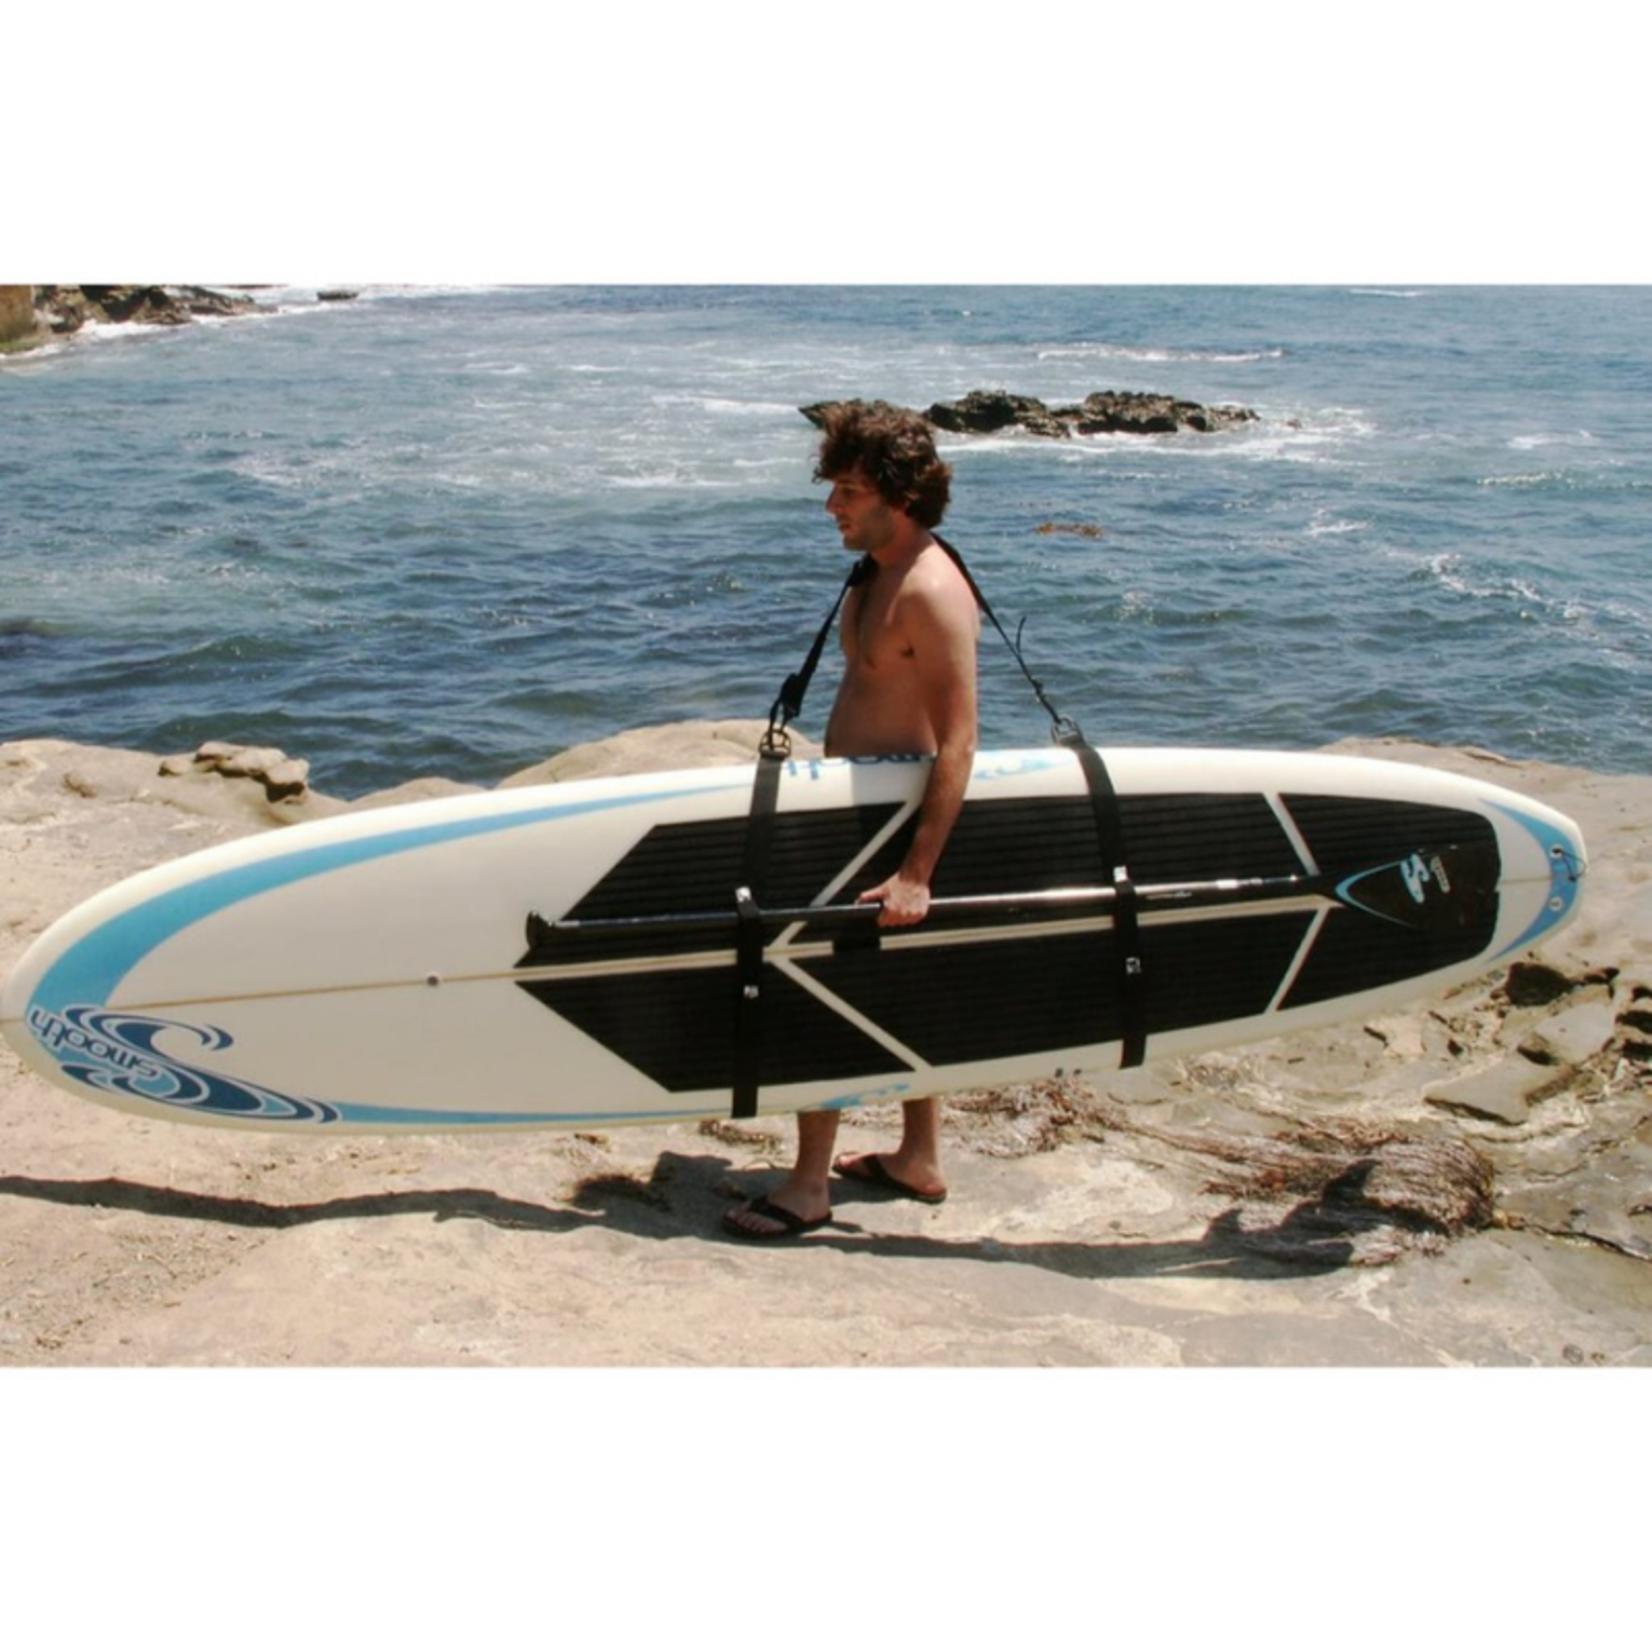 BLOCKSURF Big Board Schlepper SUP/Longboard